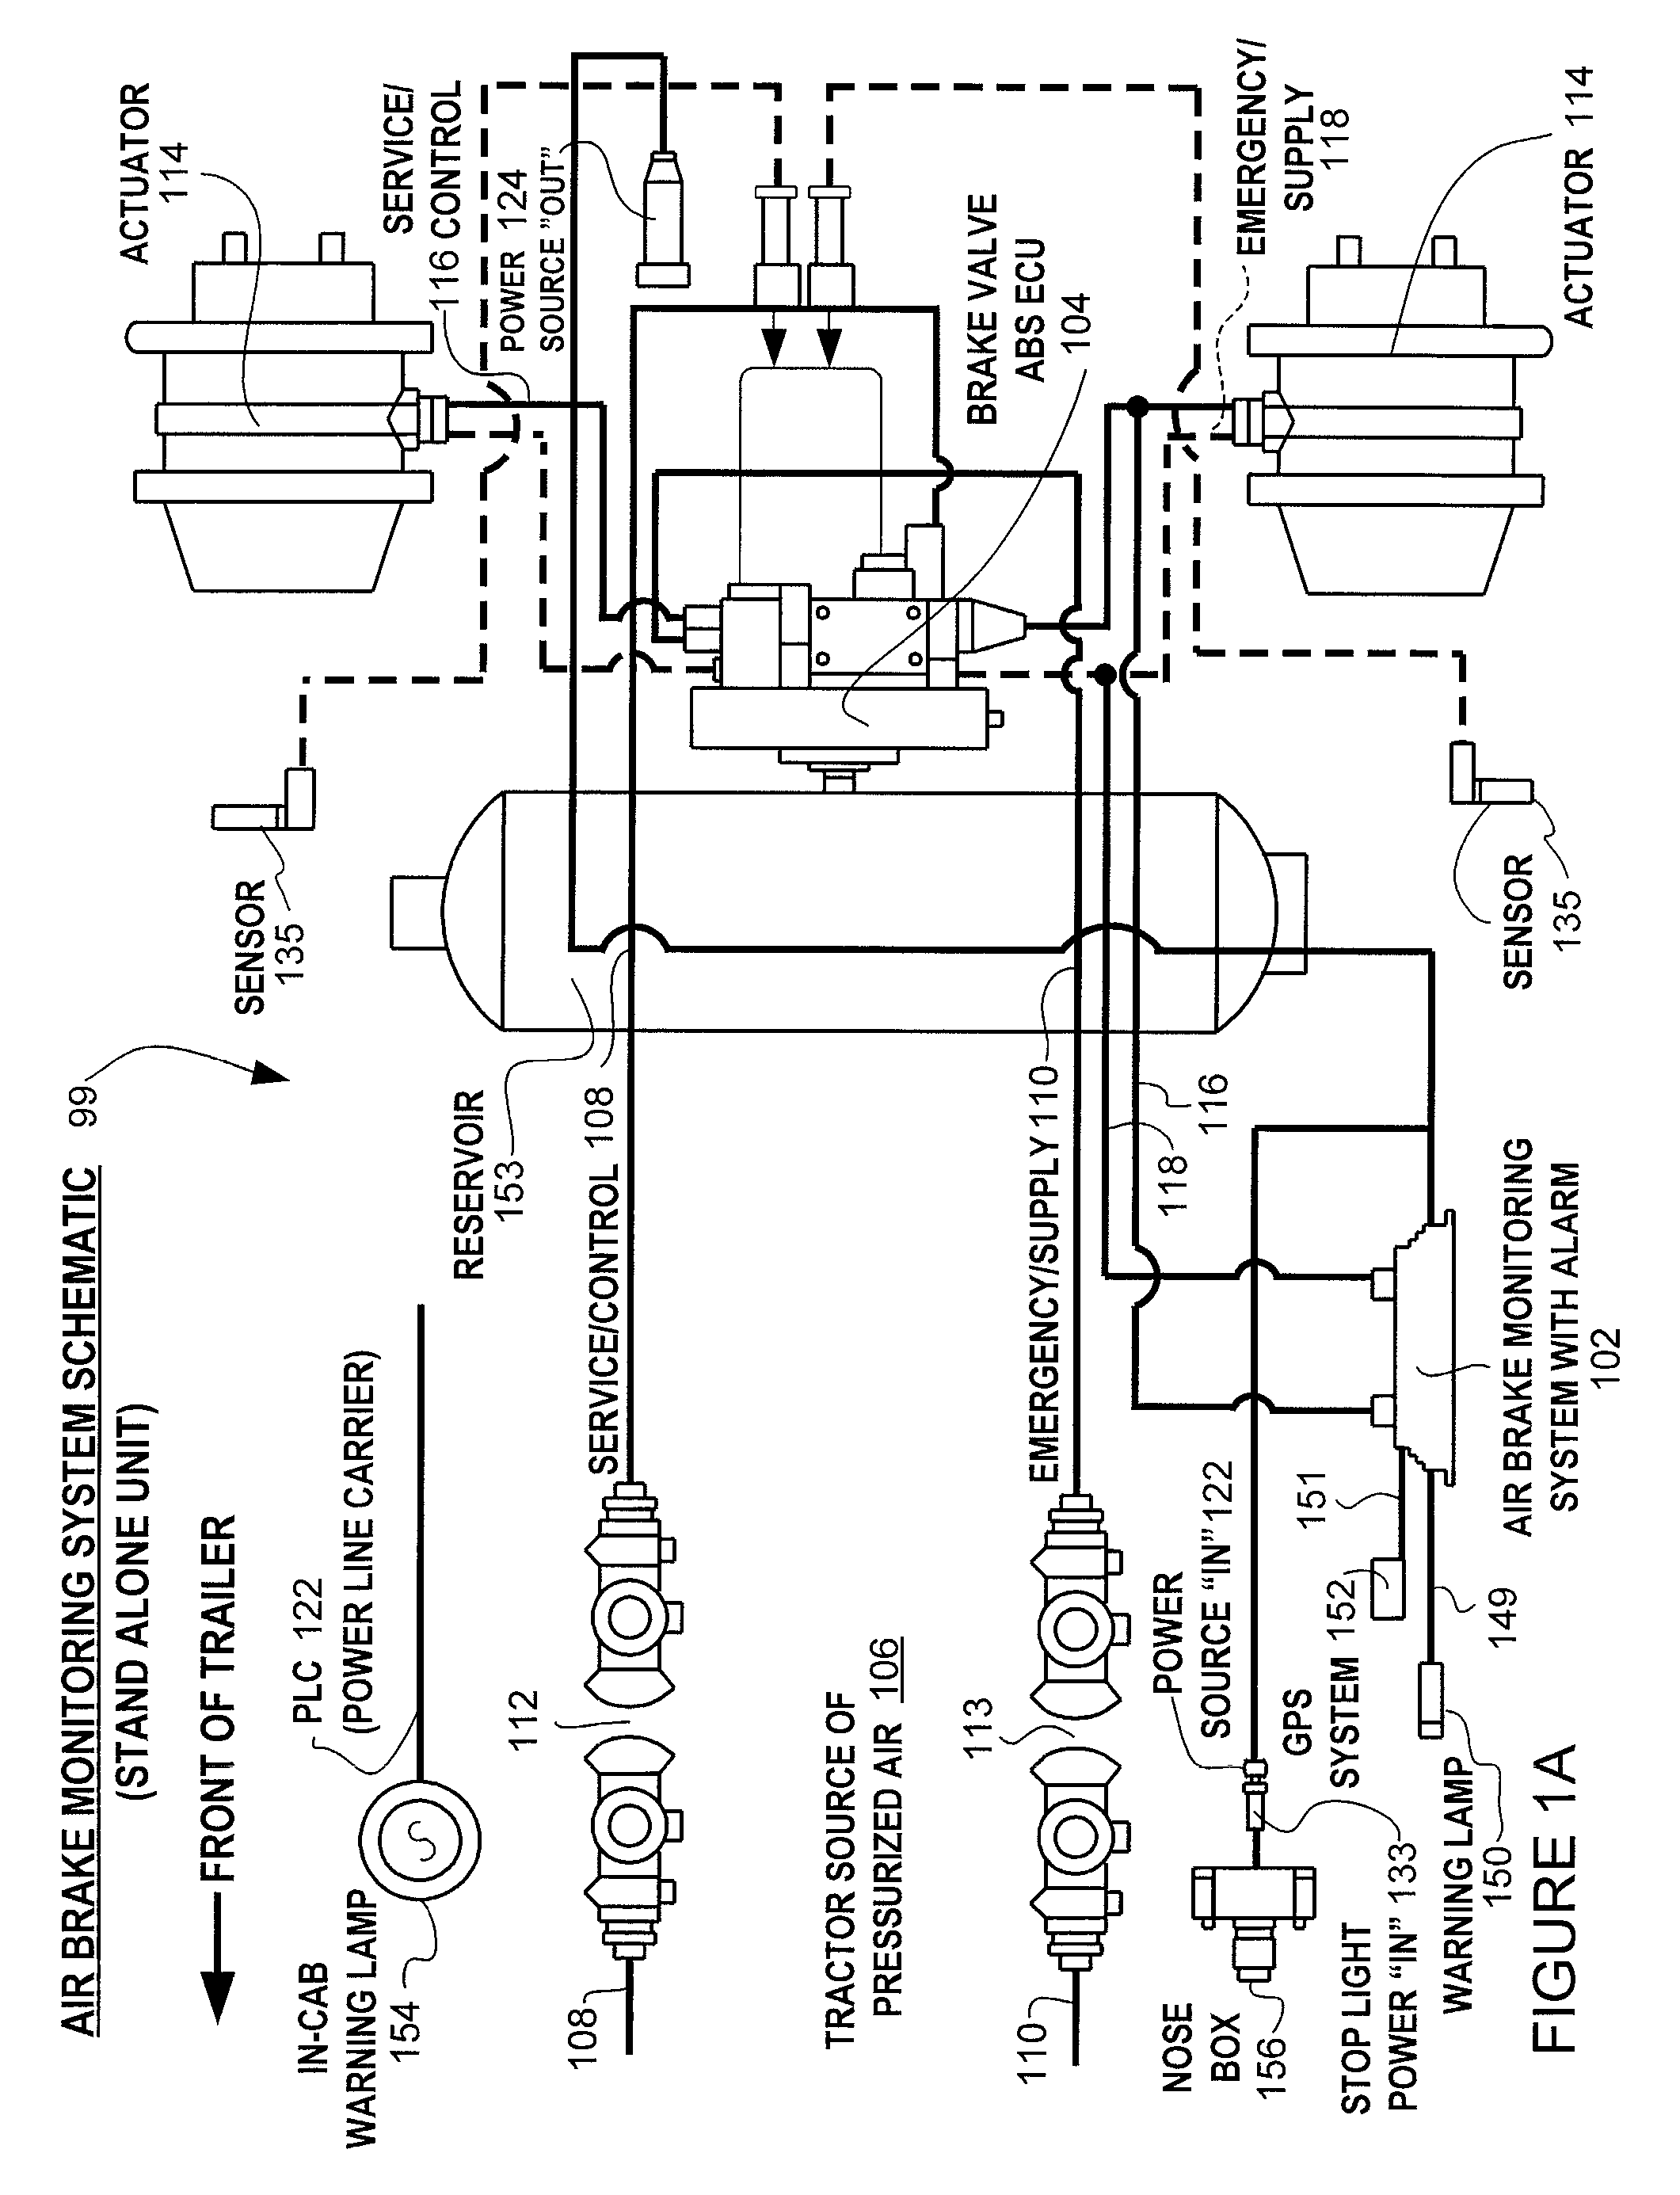 meritor wabco wiring diagram lexus is 250 engine diagram jeep 2004 Wabco Trailer ABS Valve  Semi-Trailer Light Wiring Semi- Trailer ABS Wiring Peterbilt Suspension Diagram